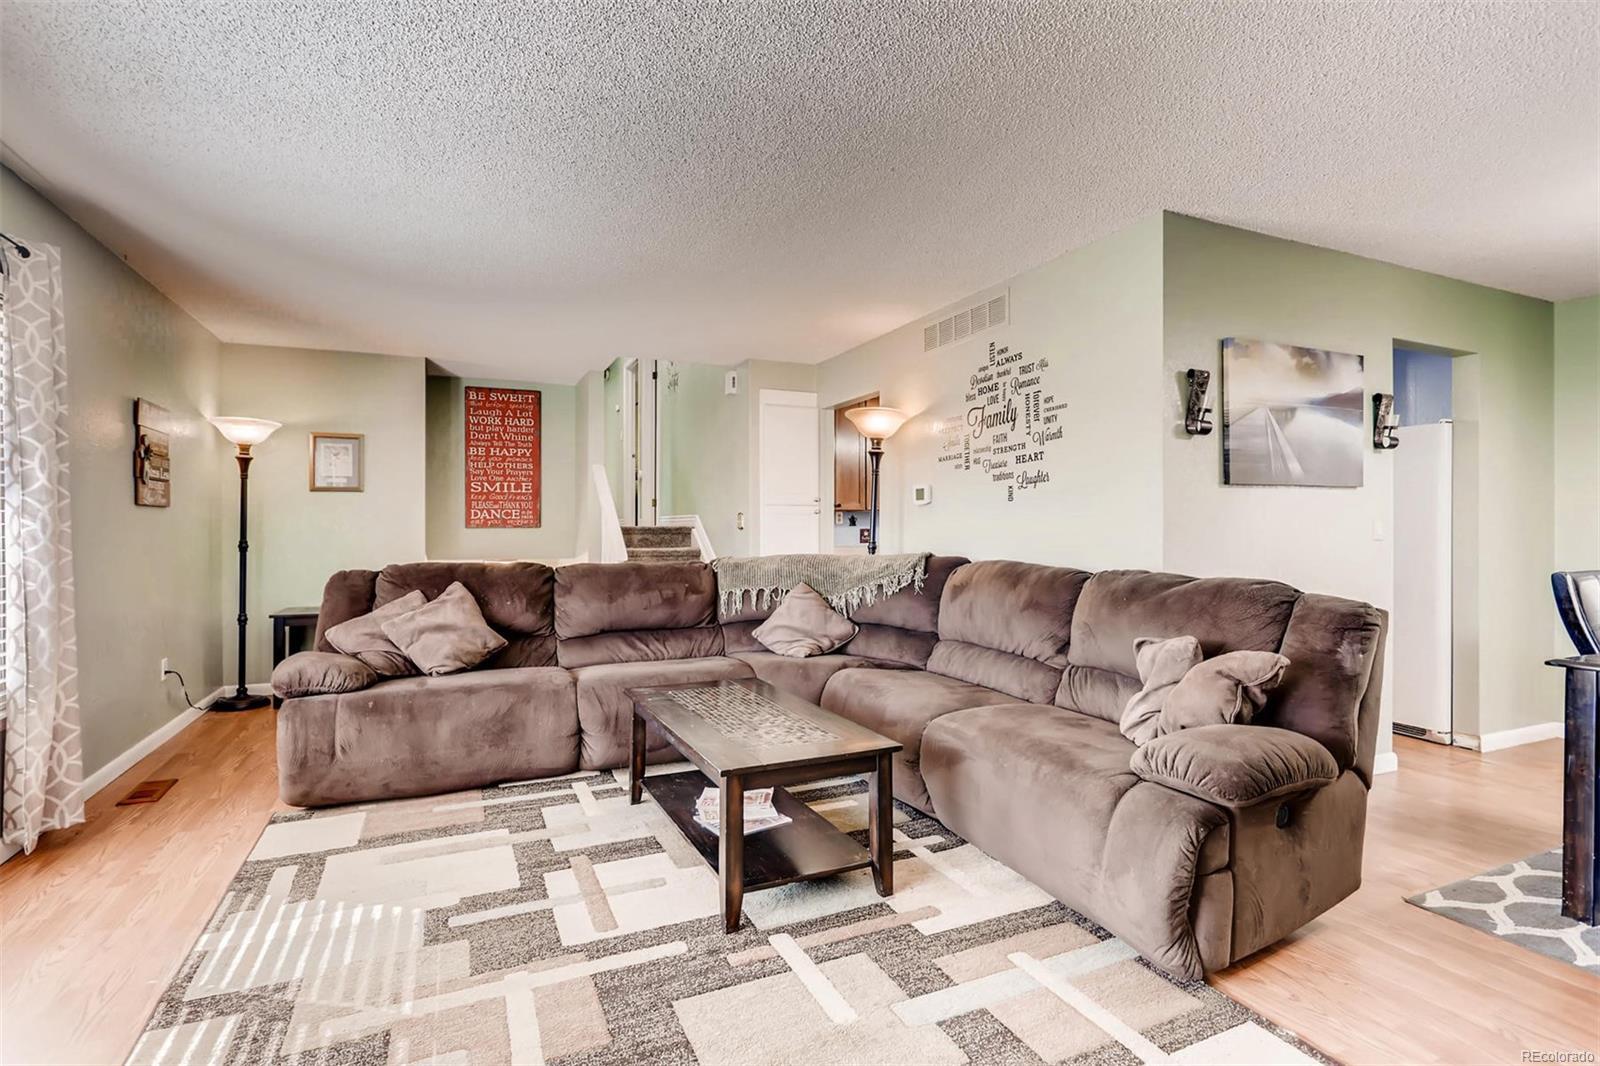 Nice sized living room for entertaining.